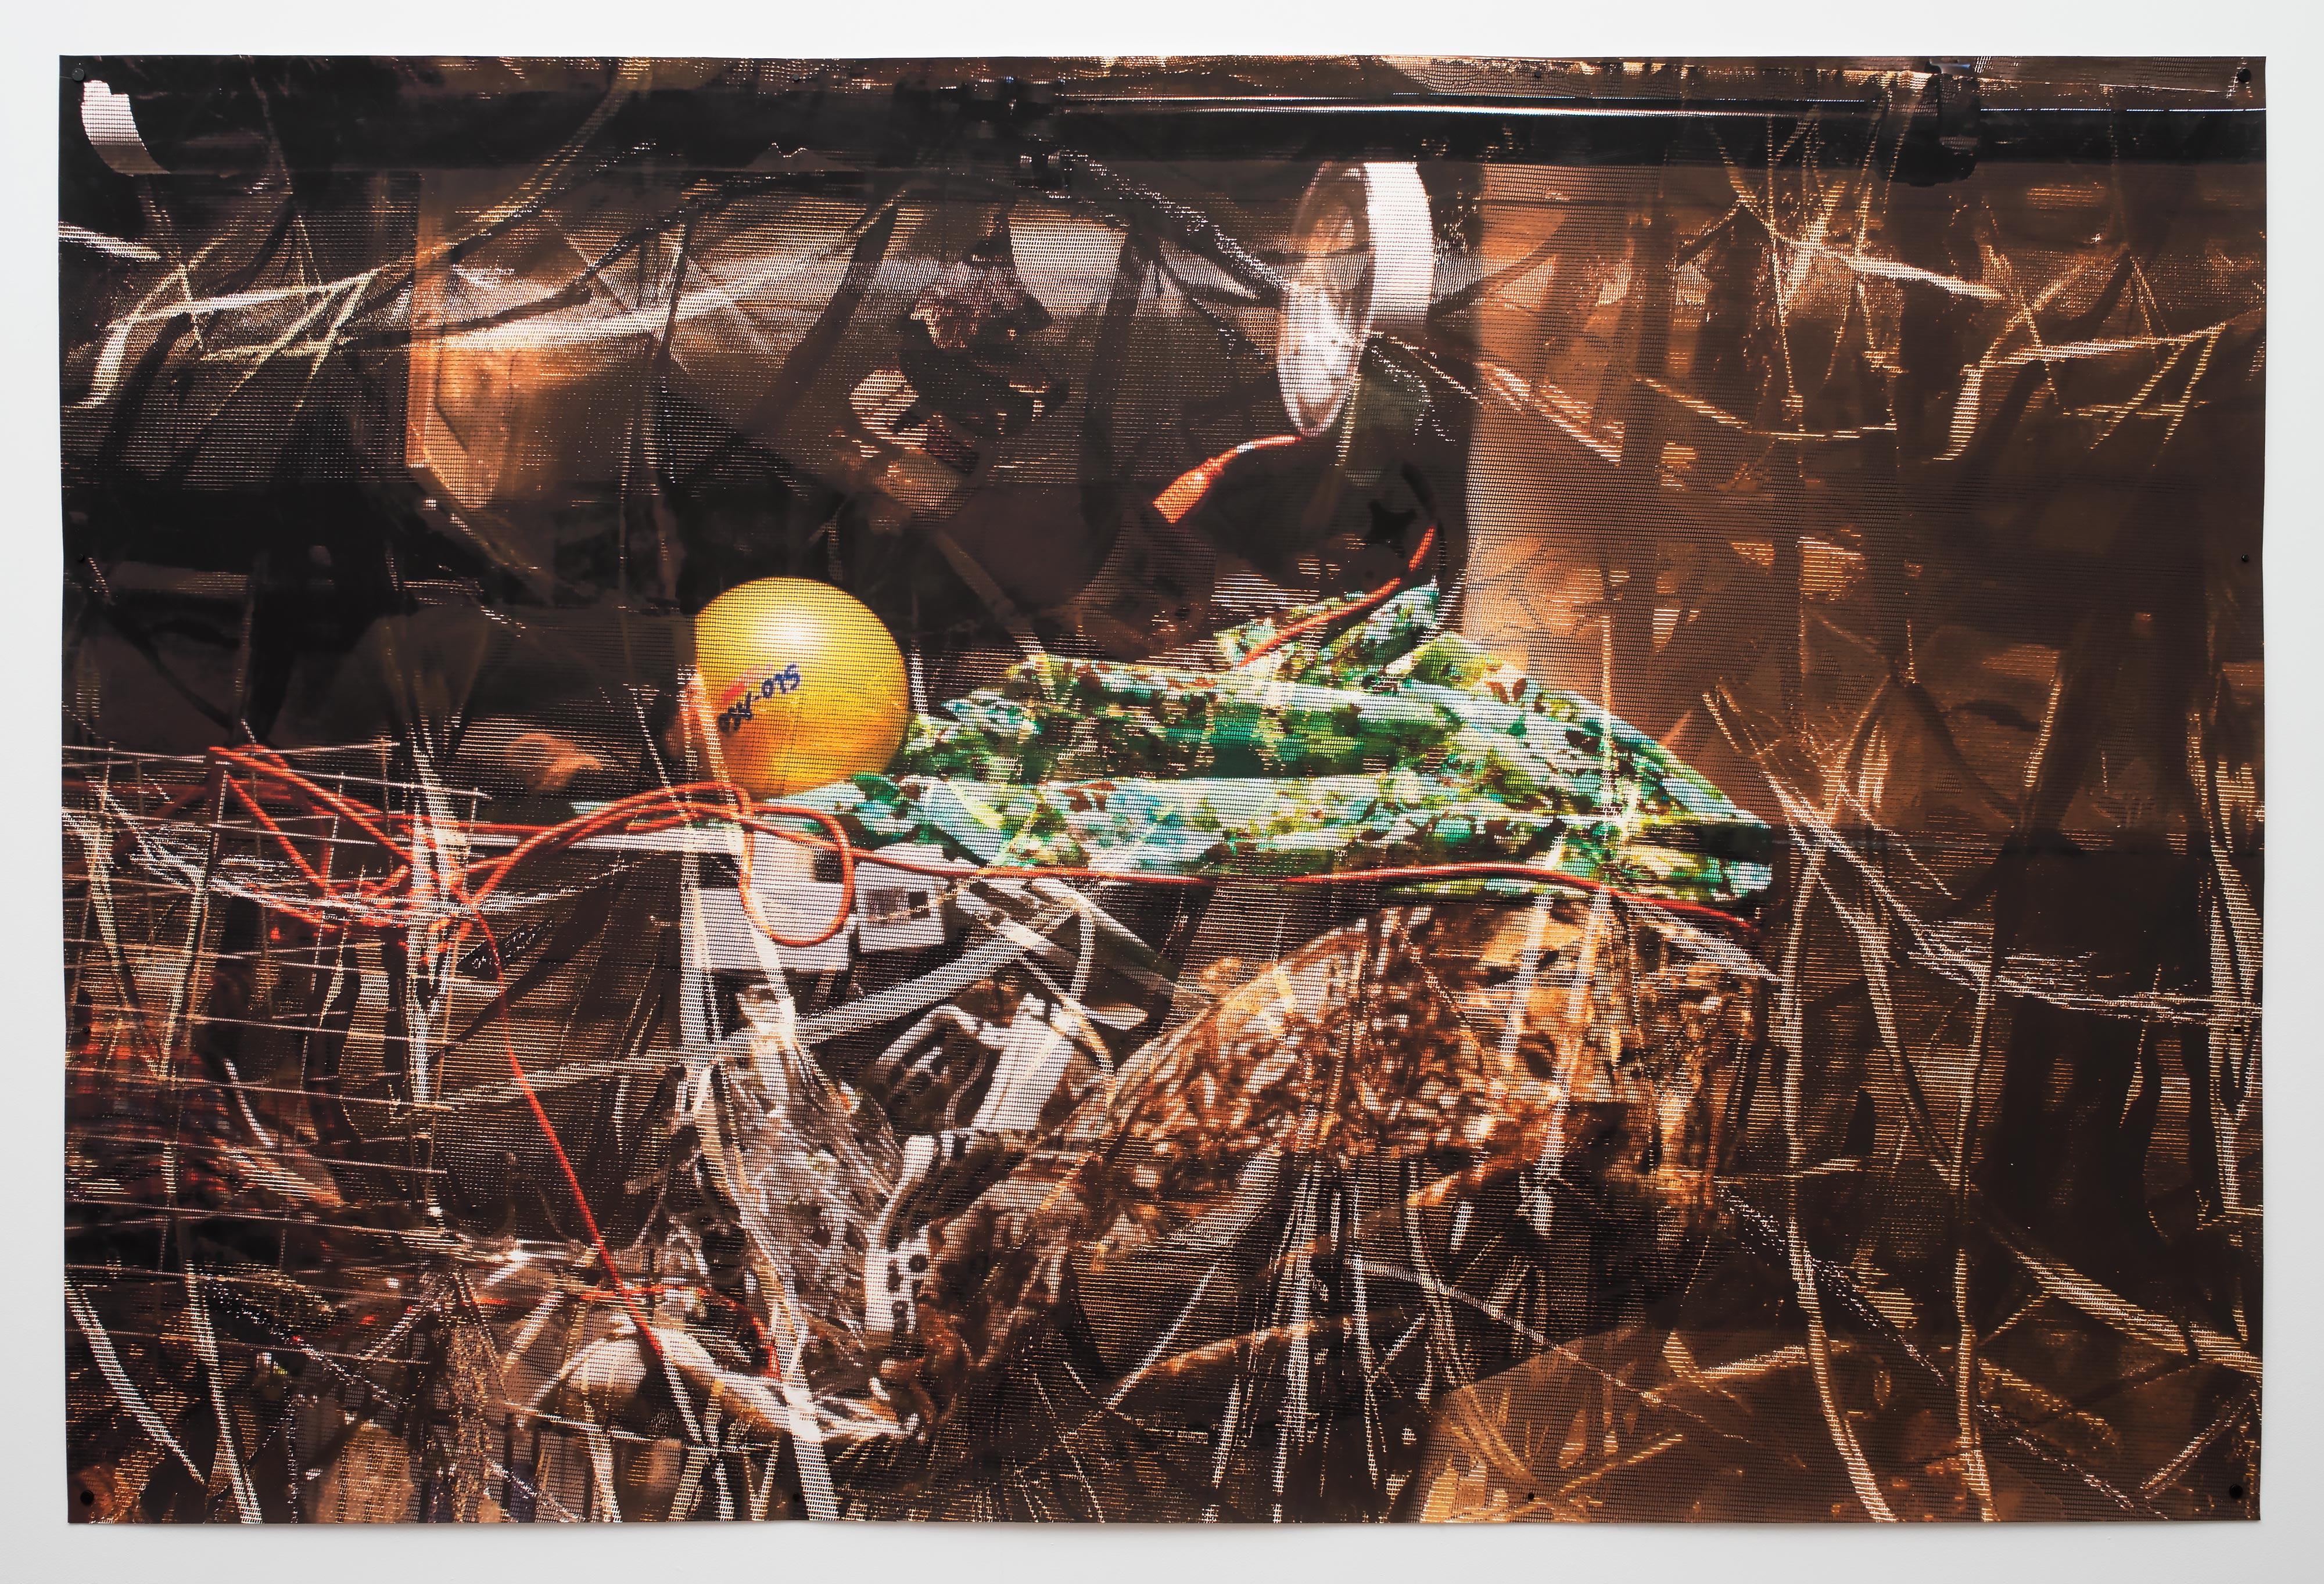 ELLEN BROOKS<br>Untitled (levitation)<br>2016<br>Digital pigment print<br>58 x 87 in (147 x 221 cm)